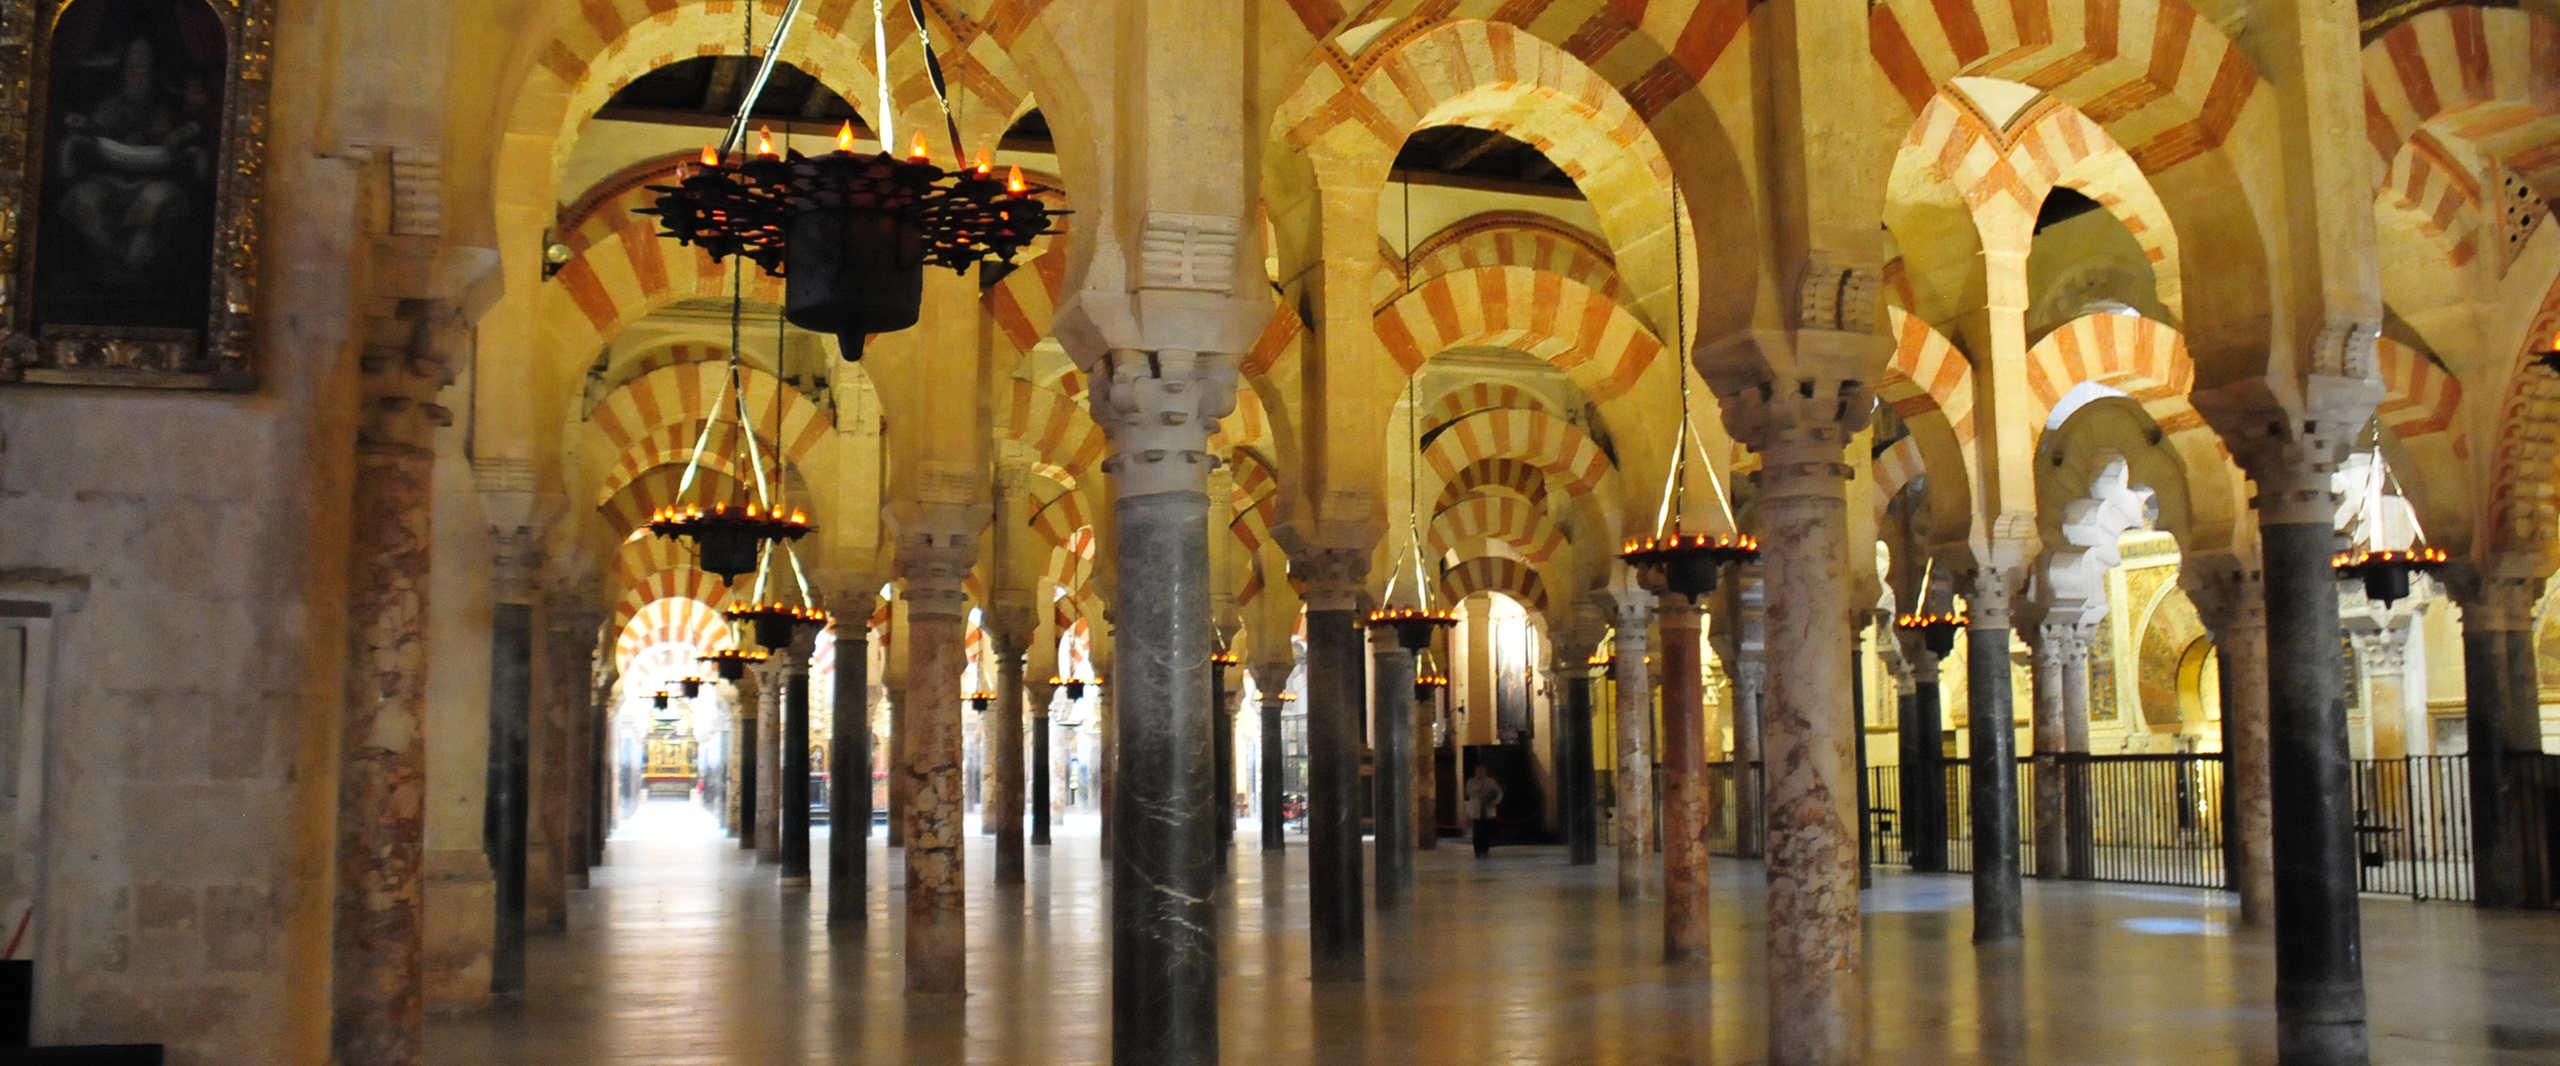 Andalusische Saeulen